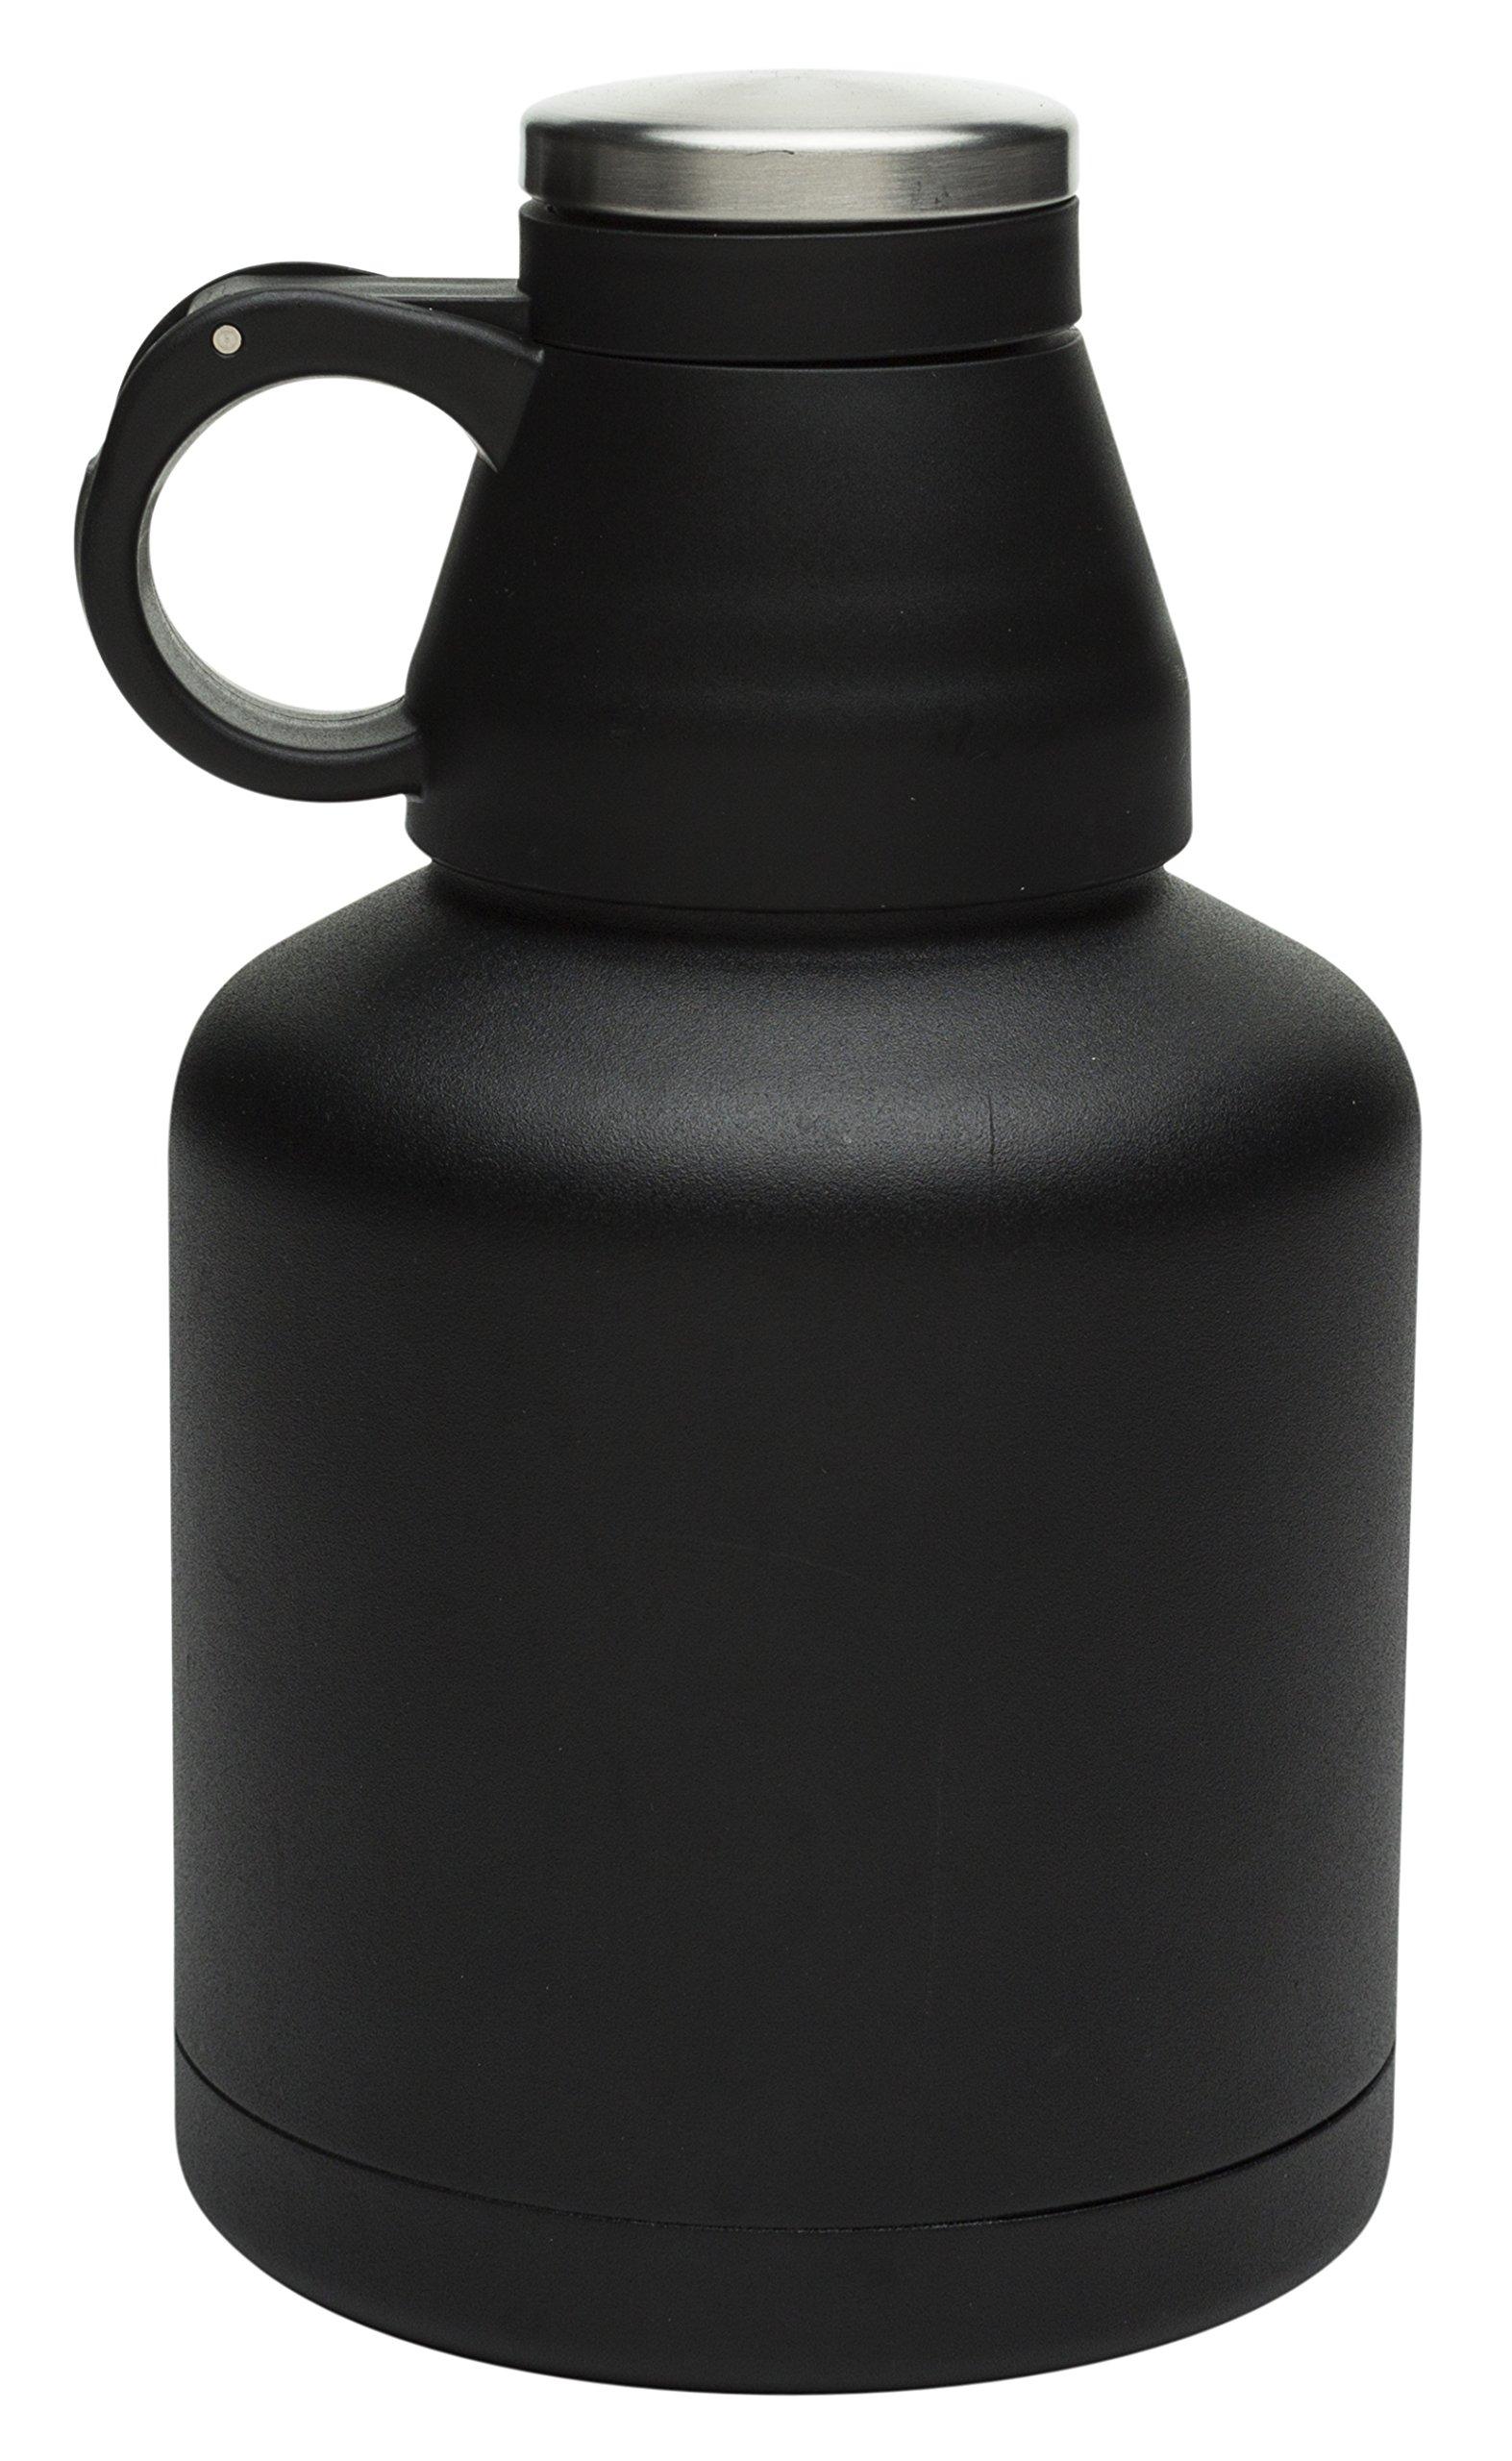 Zak Designs Planet Zak 32 oz. Insulated Beer Growler, Black